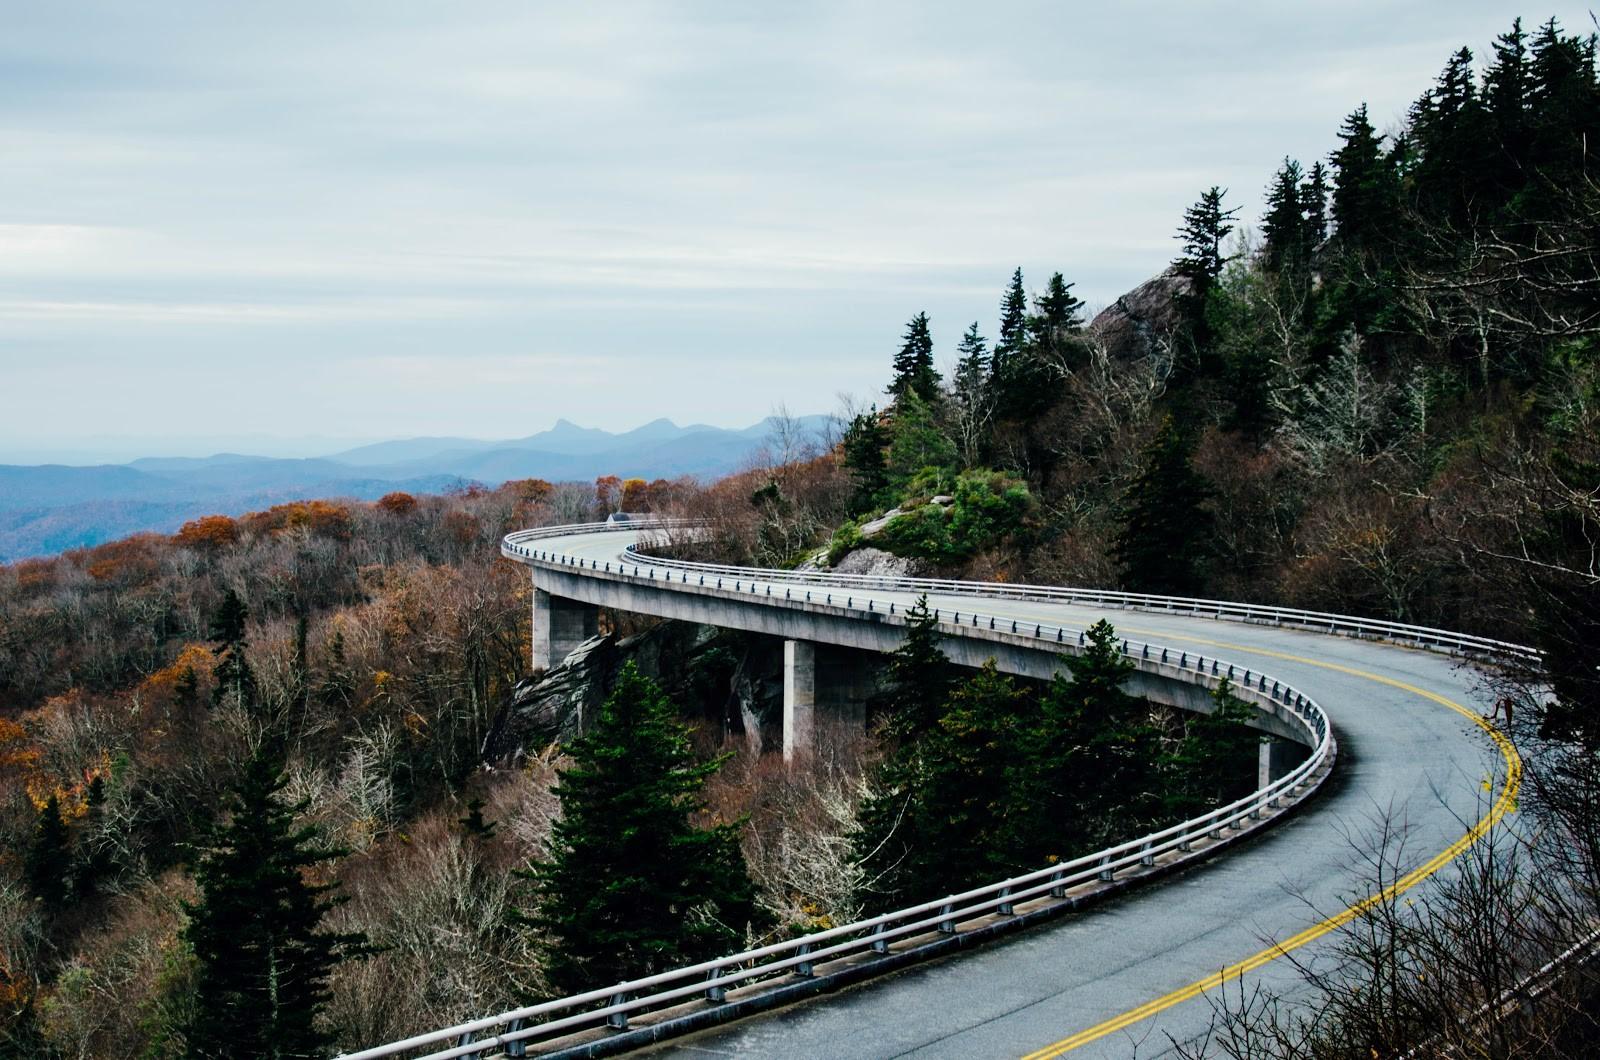 Blue Ridge Parkway, USA